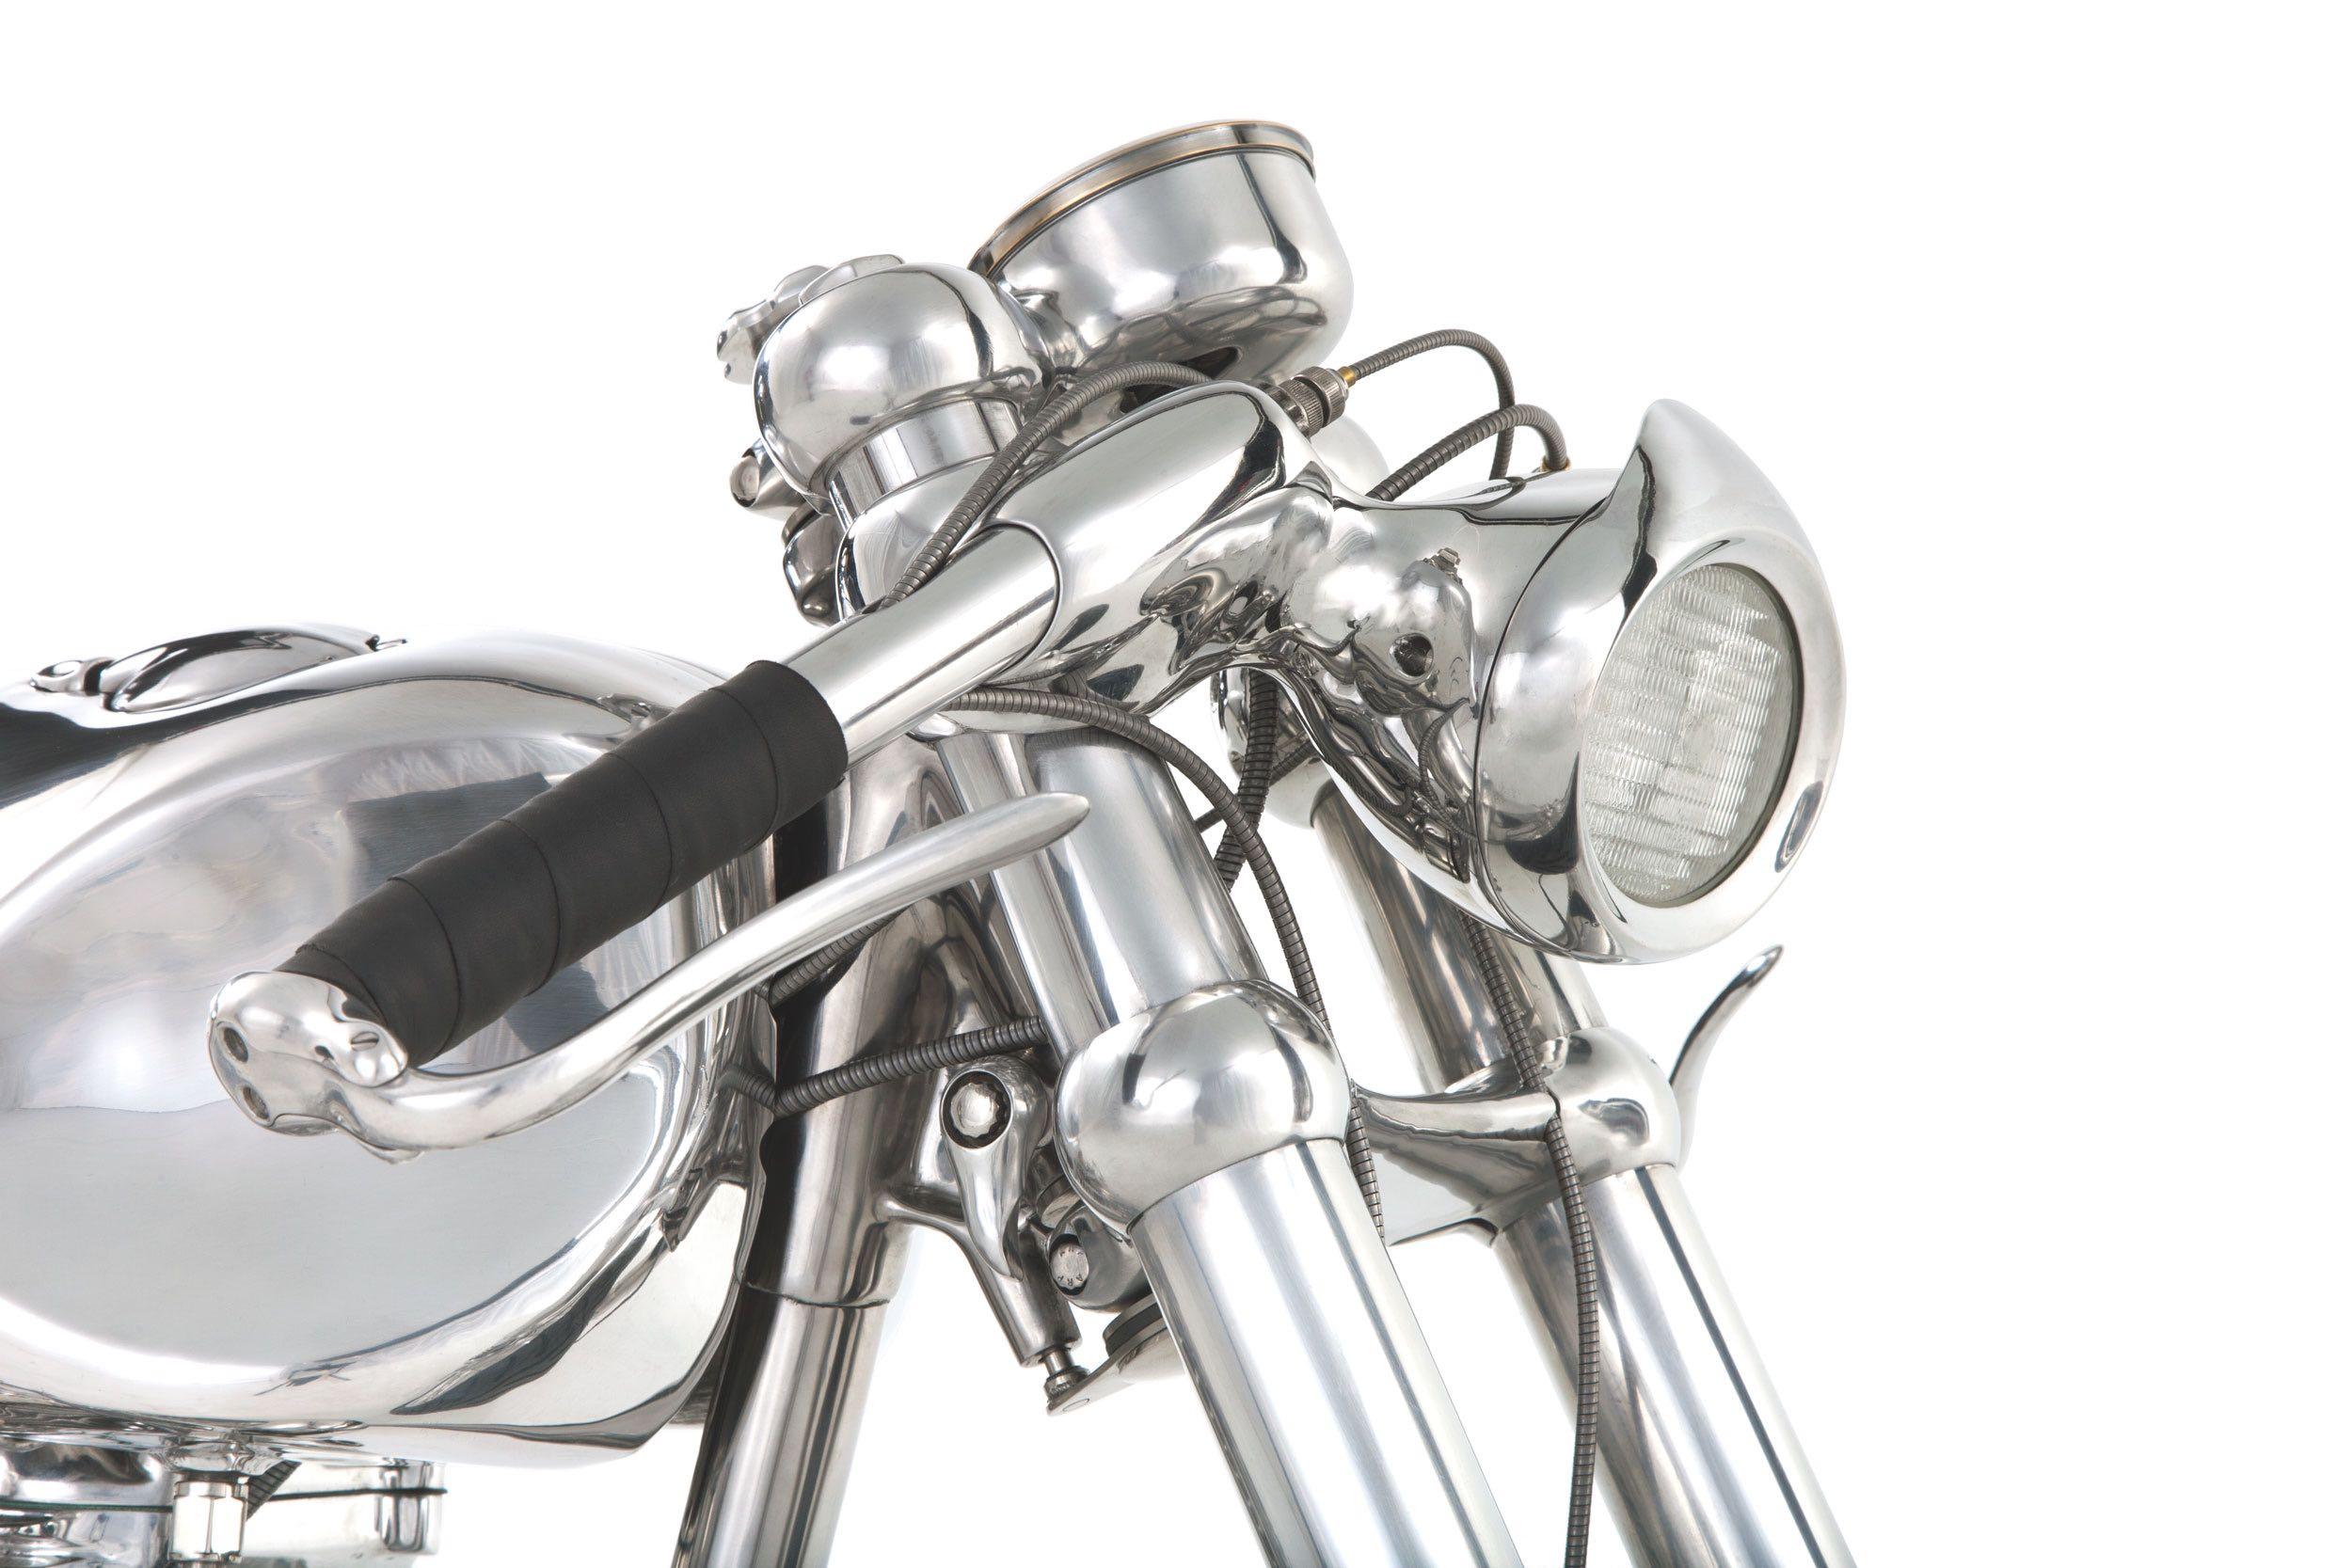 White-Right-Headlight-Profile-Web.jpg